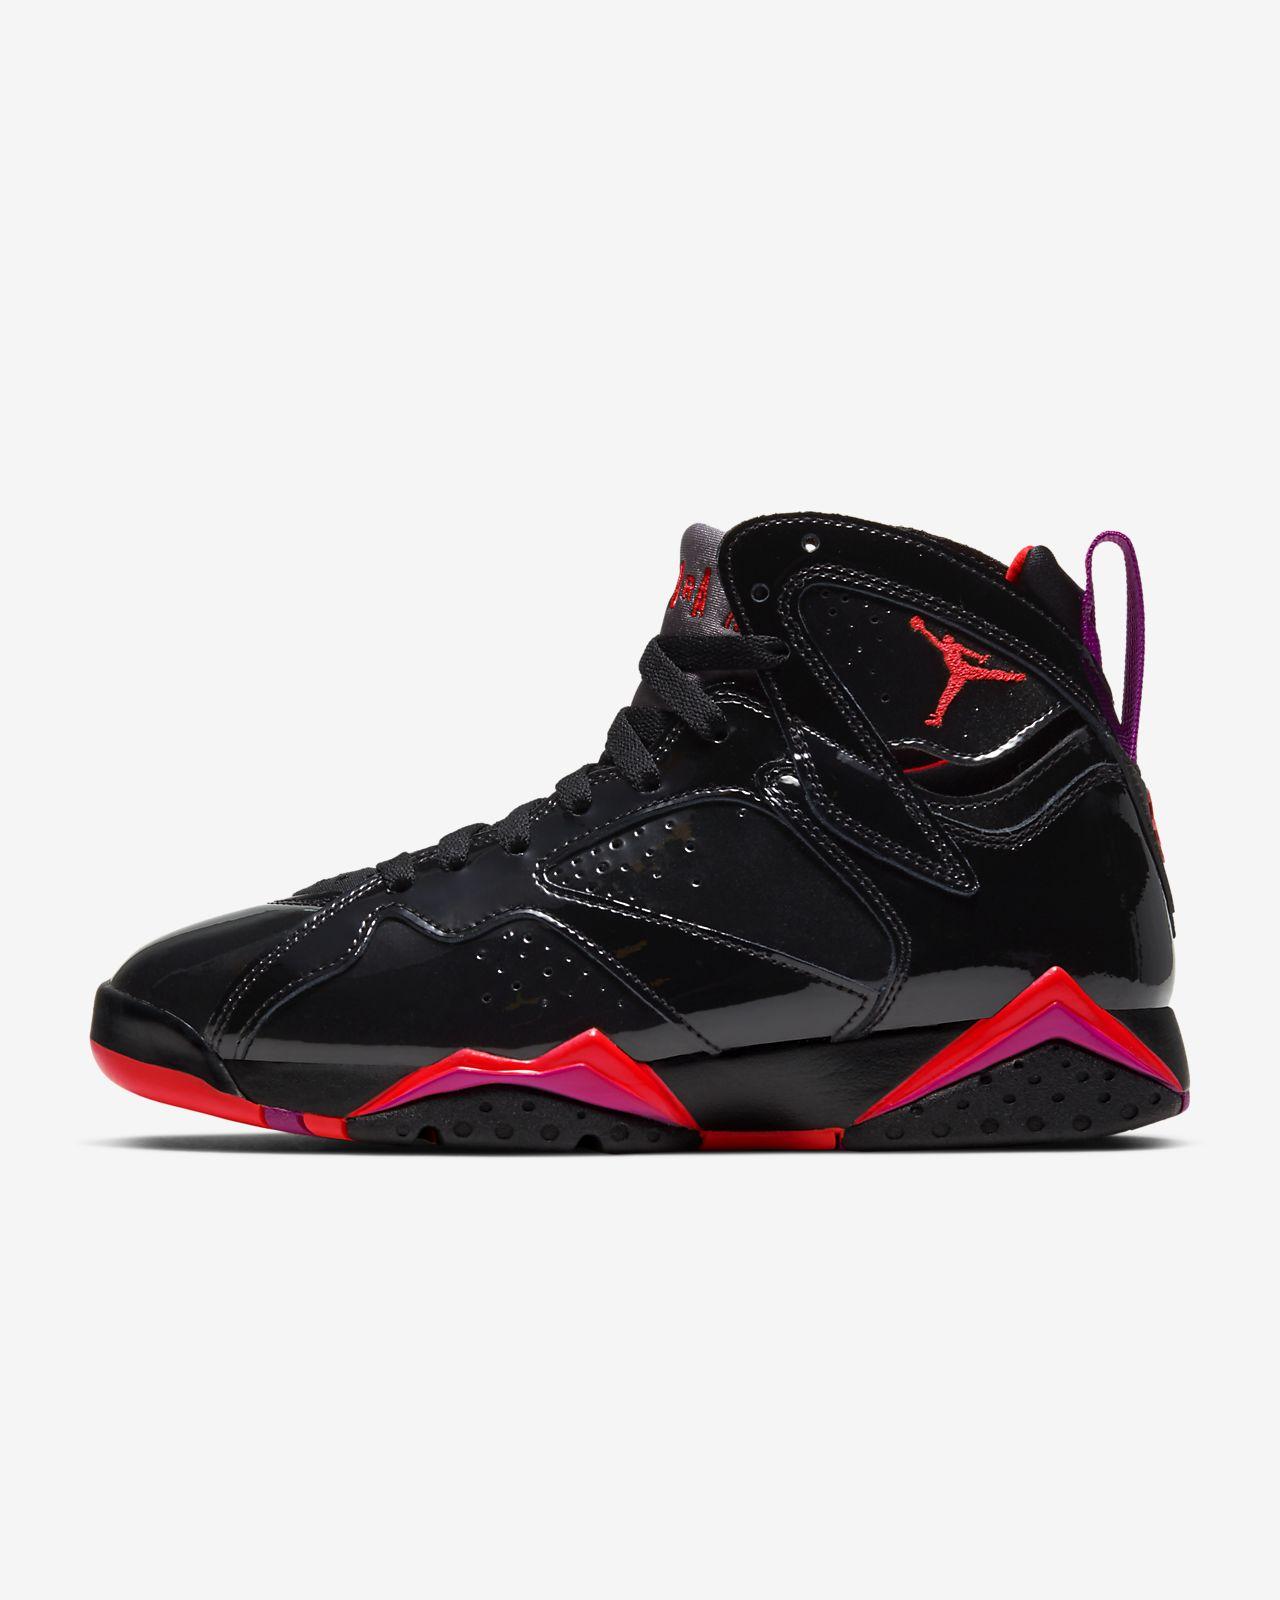 Air Jordan 7 Retro Women's Shoe